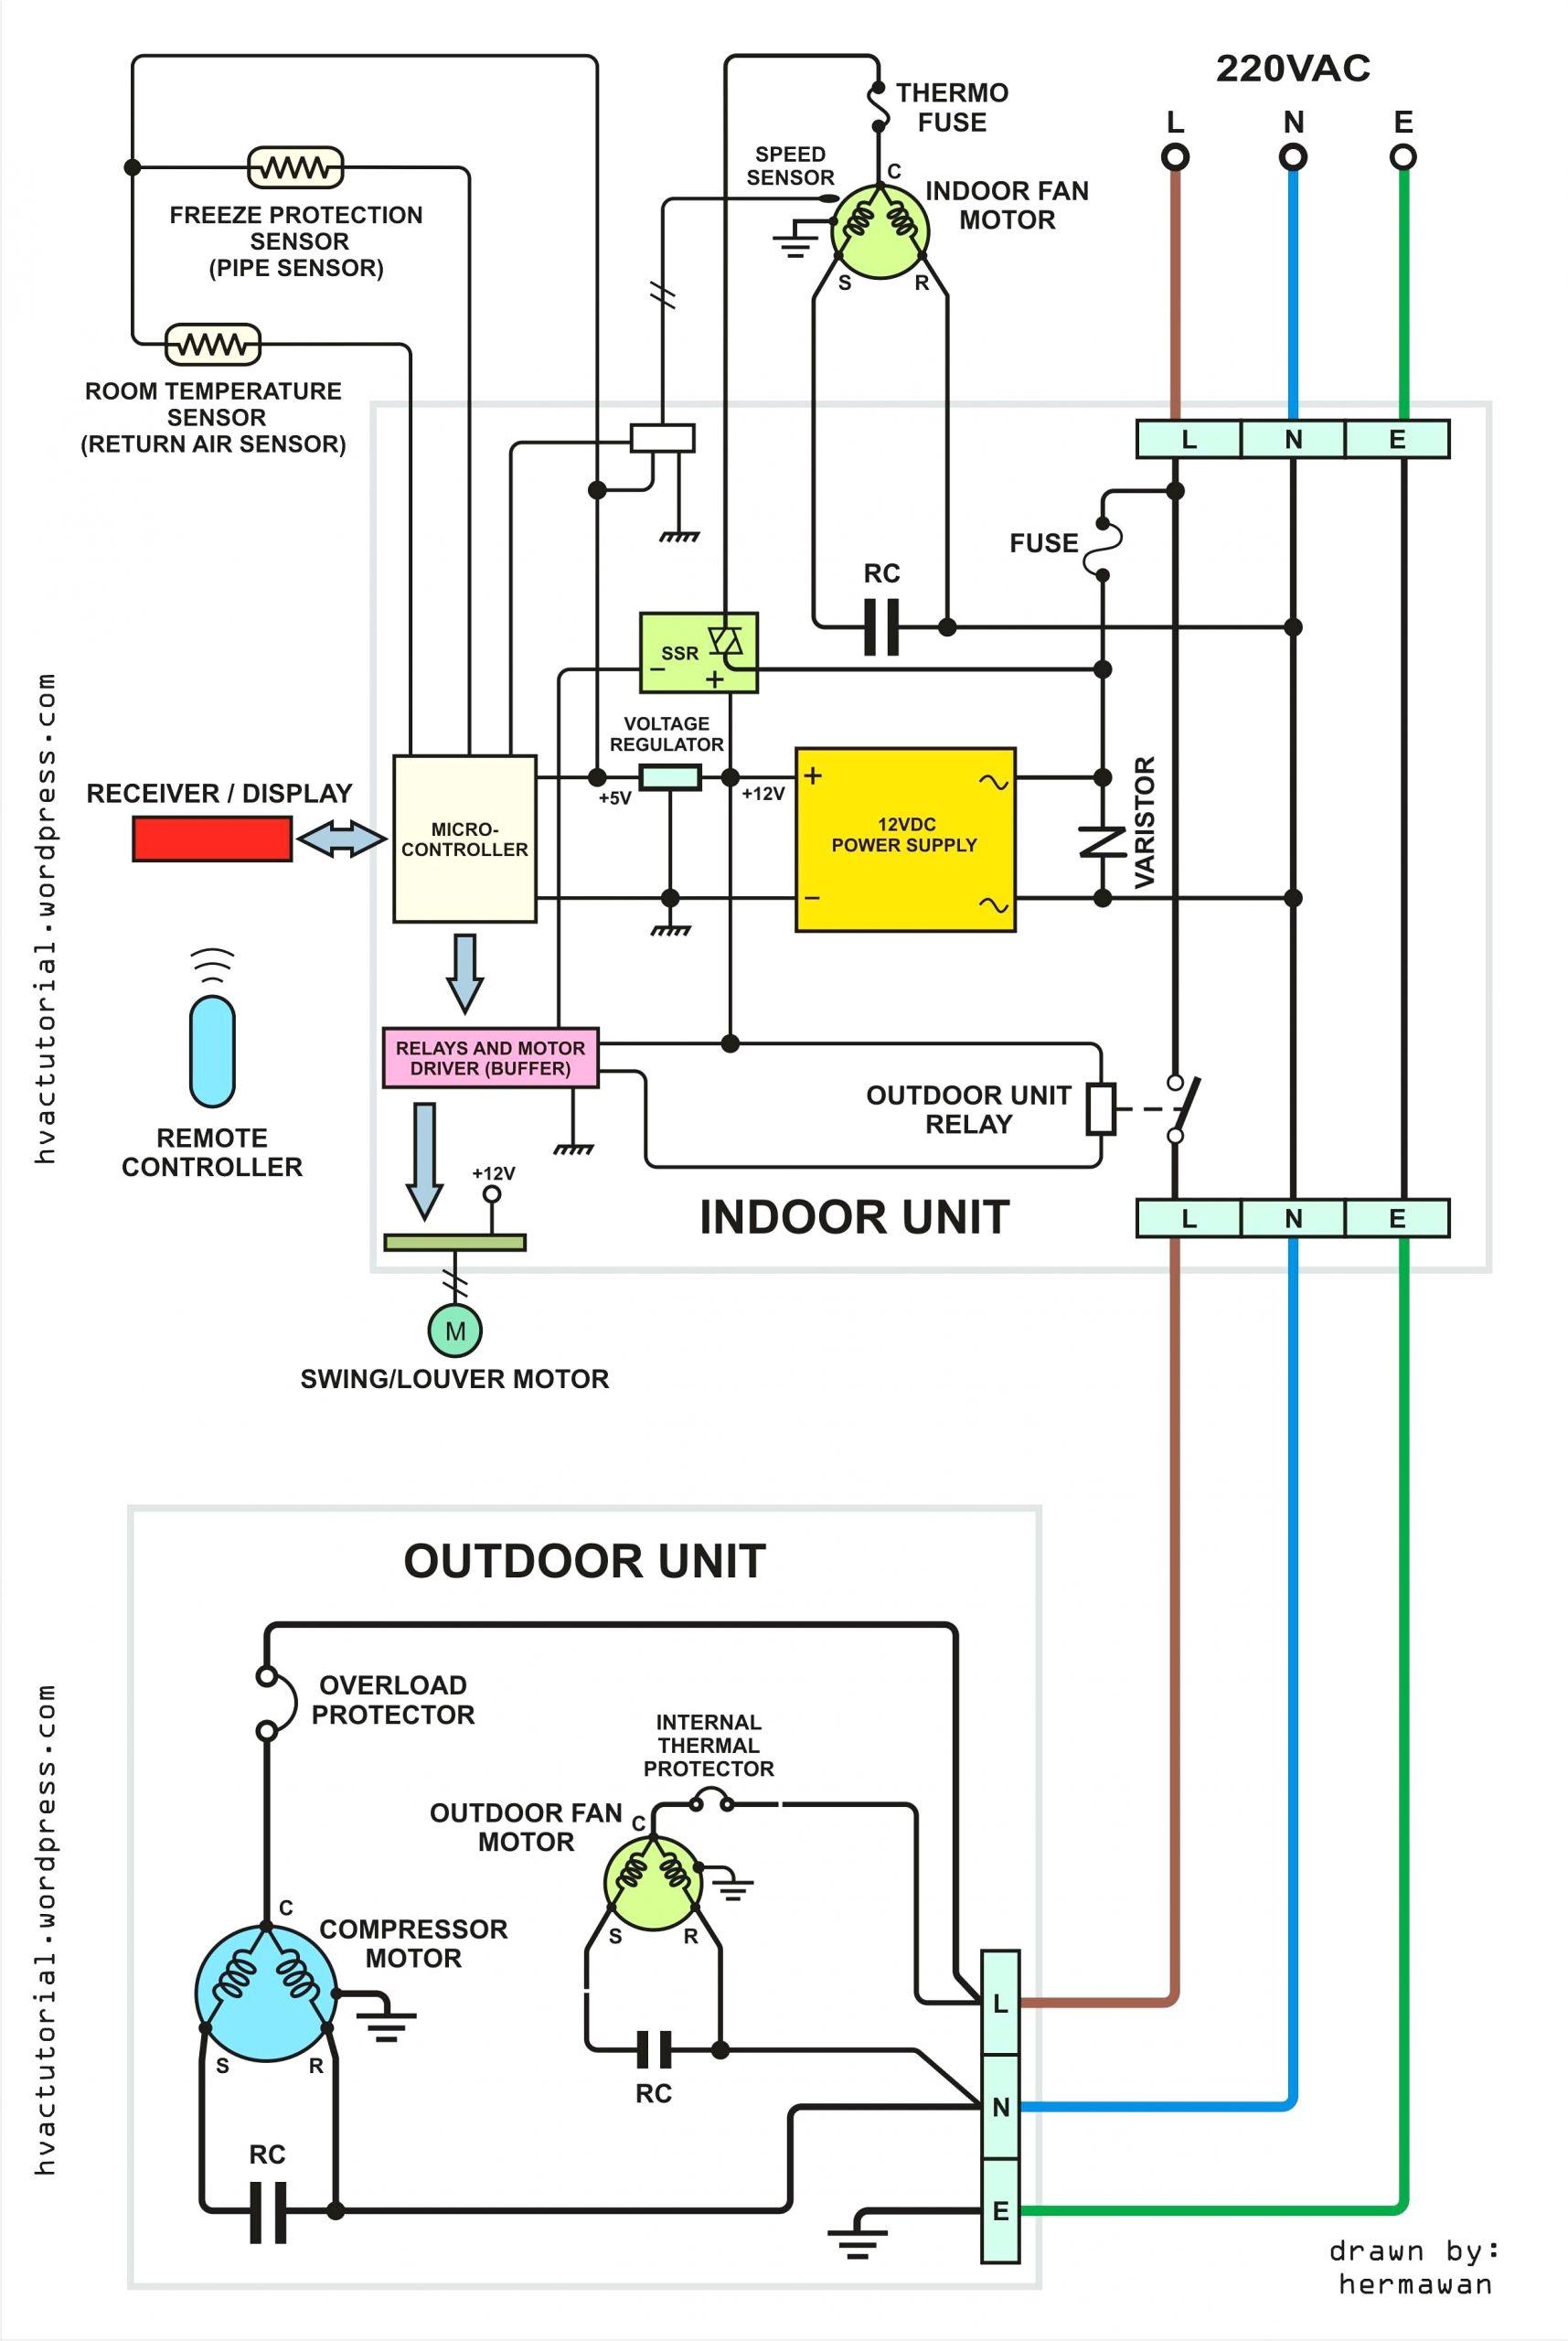 altronix rb5 wiring diagram relay module wiring diagram example electrical wiring diagram e280a2 honeywell 5800pir od diagrams 10q jpg